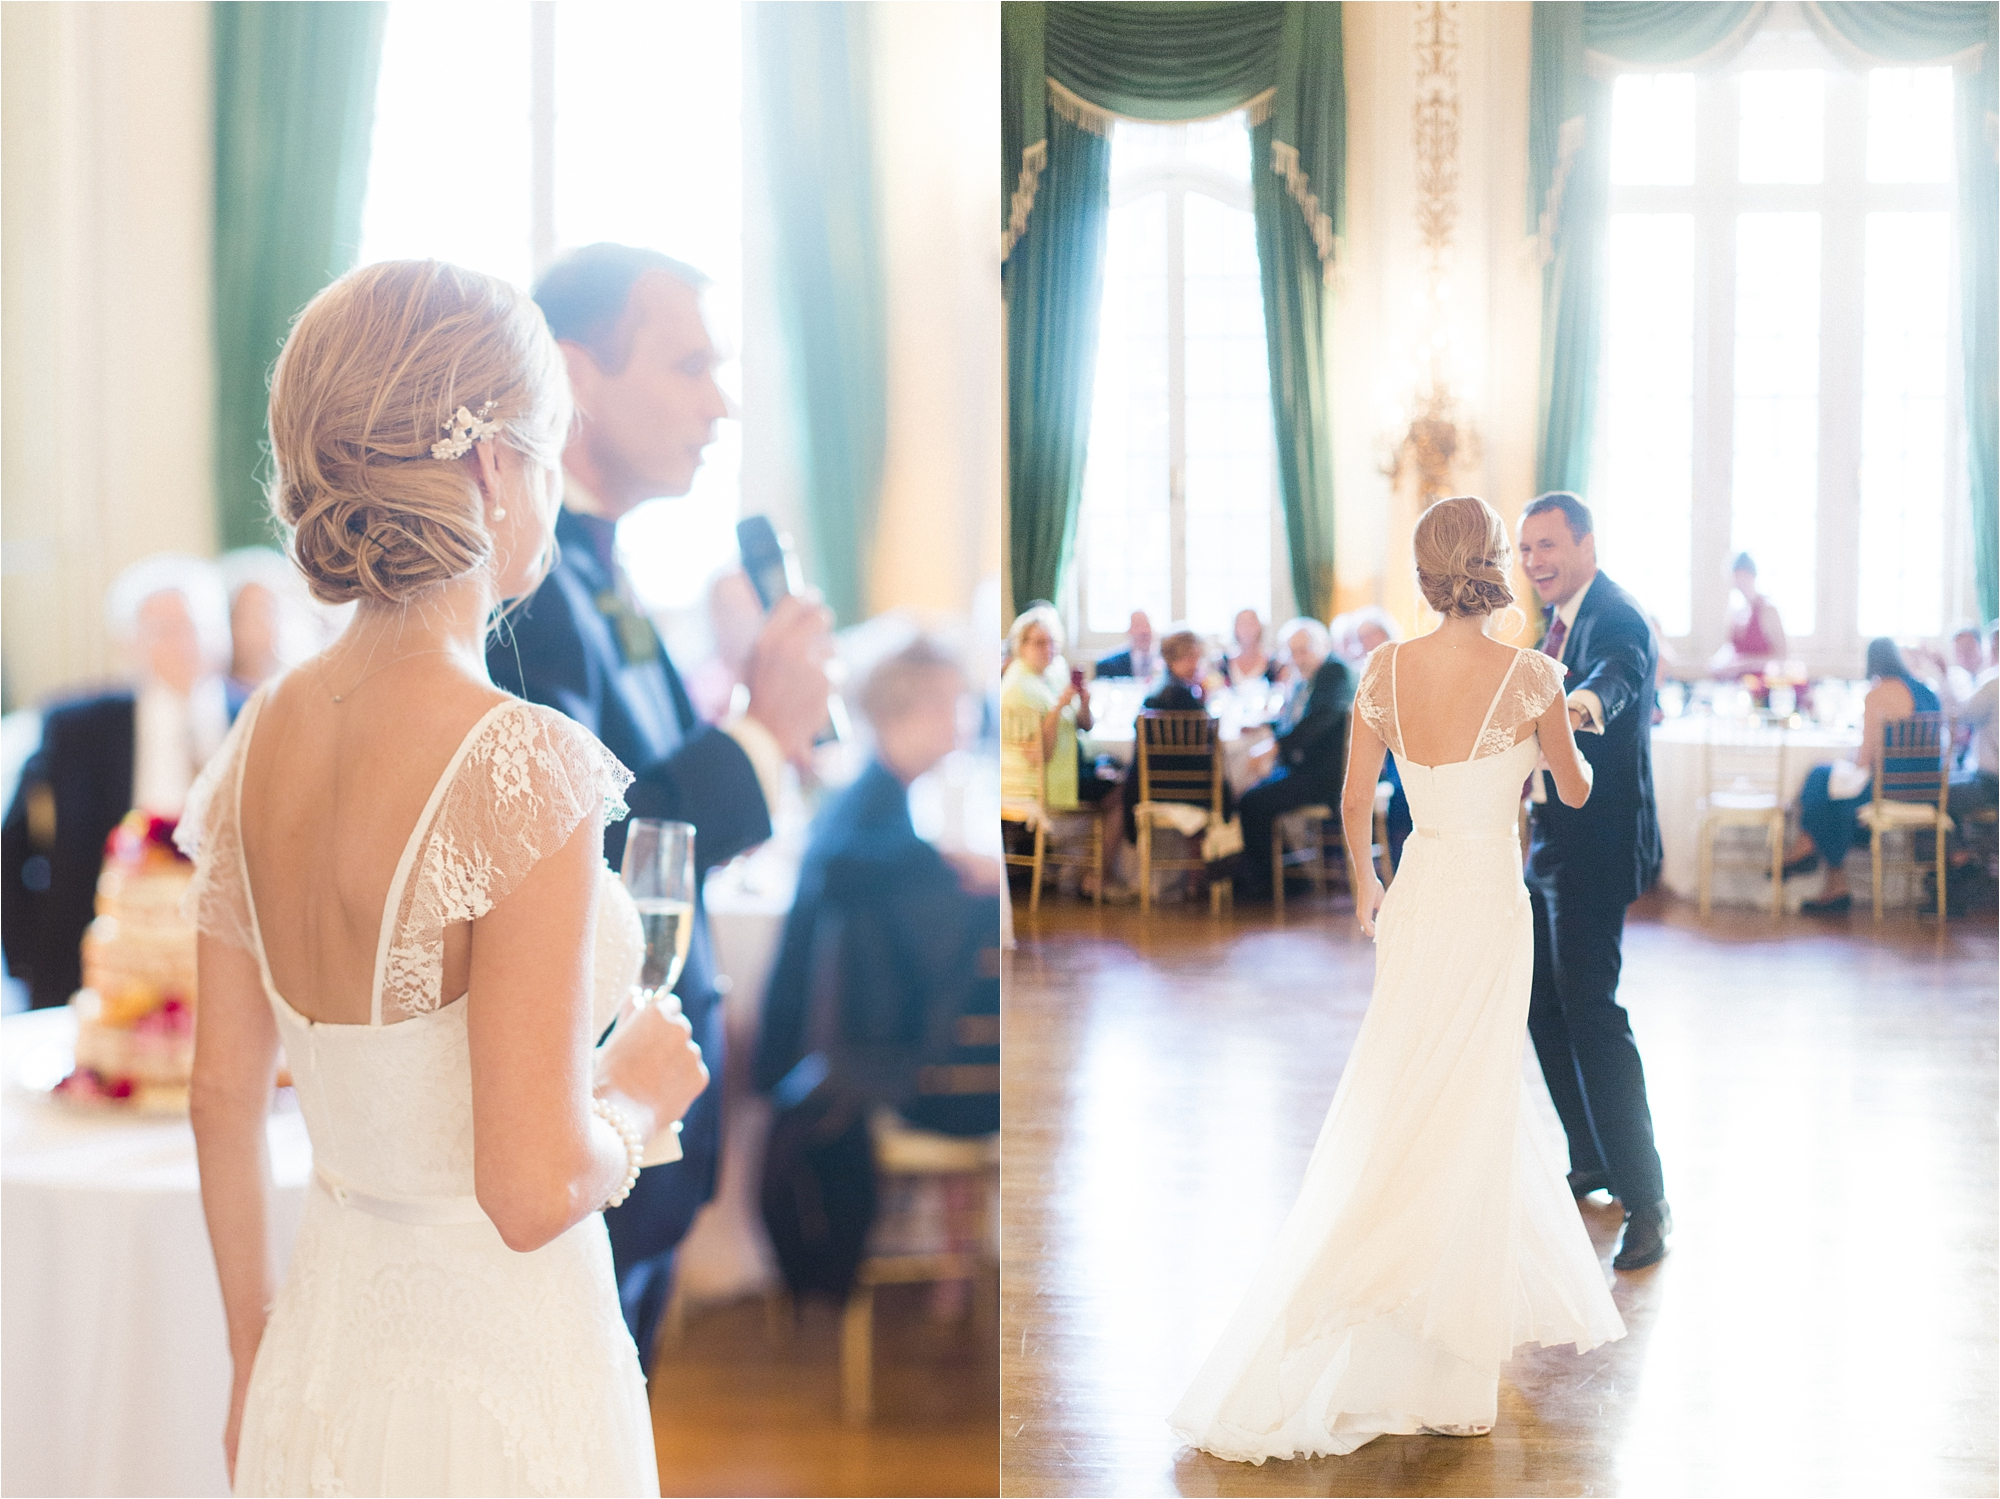 stephanie-yonce-photography-elegant-private-club-washington-dc-wedding-photos_0049.jpg